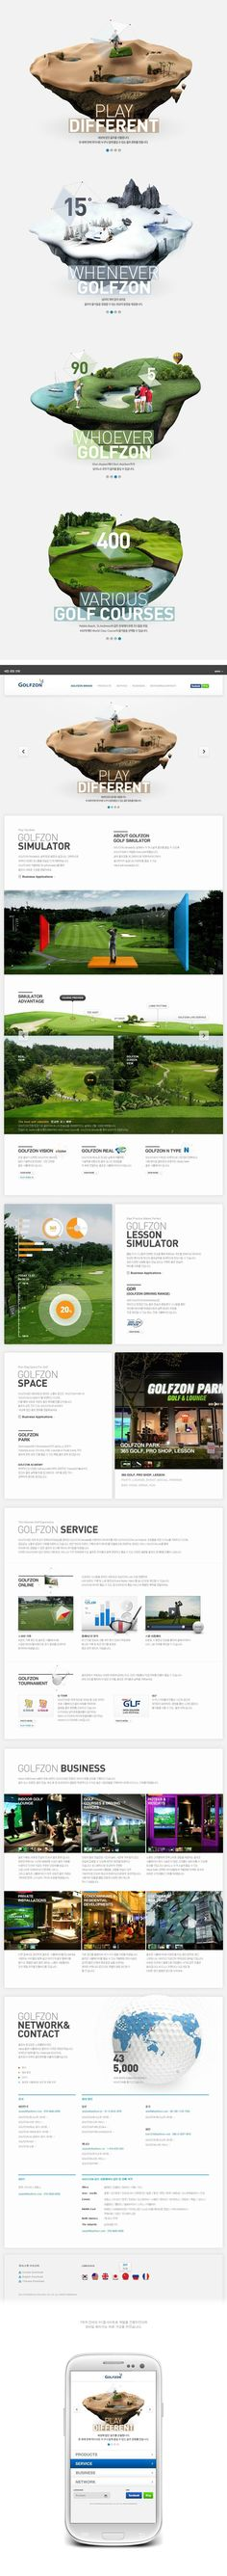 GolfZone Global Website Design by Plus X , via Behance